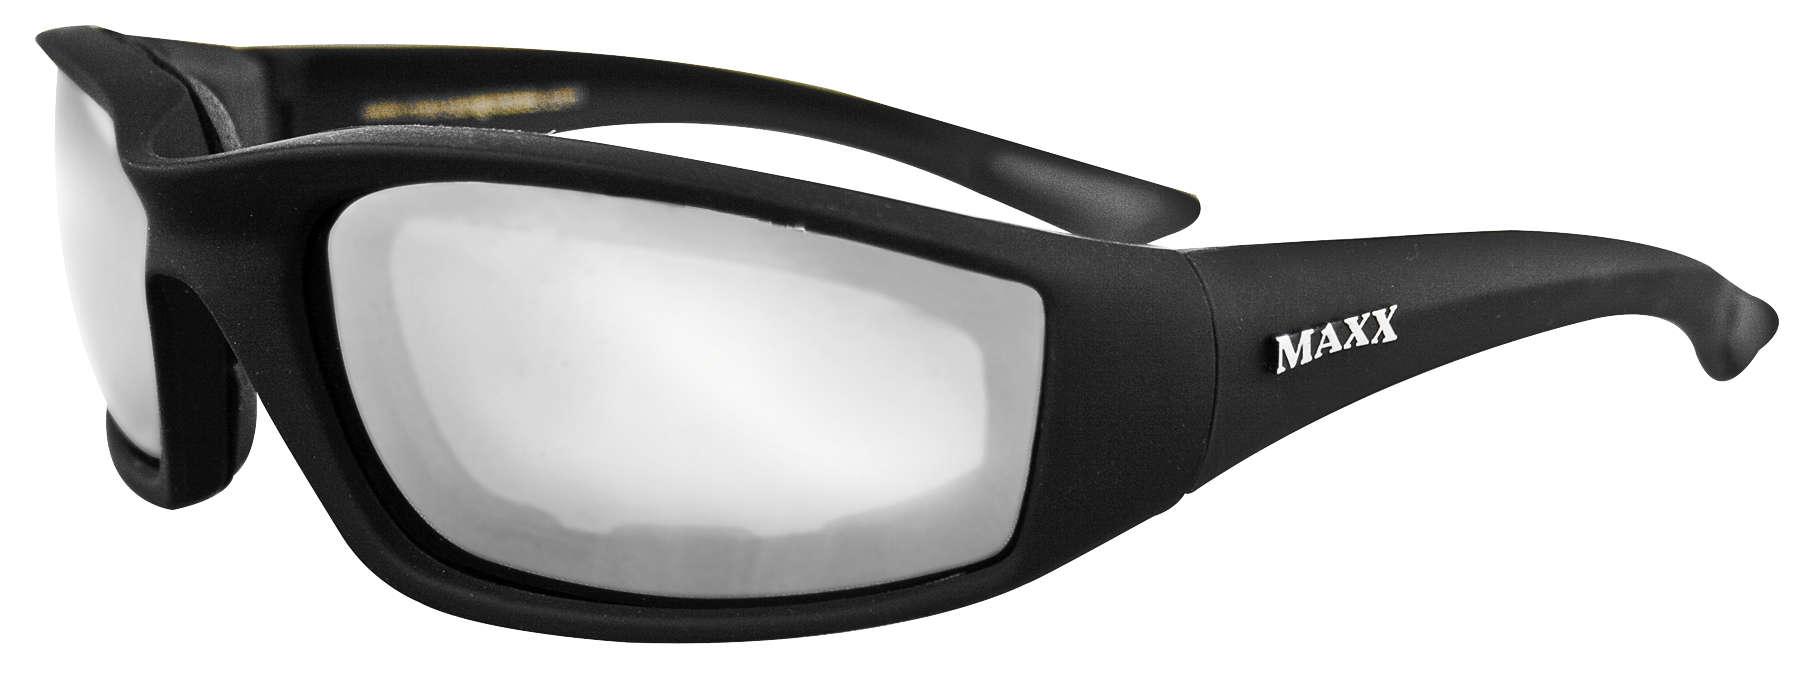 Padded Sunglasses